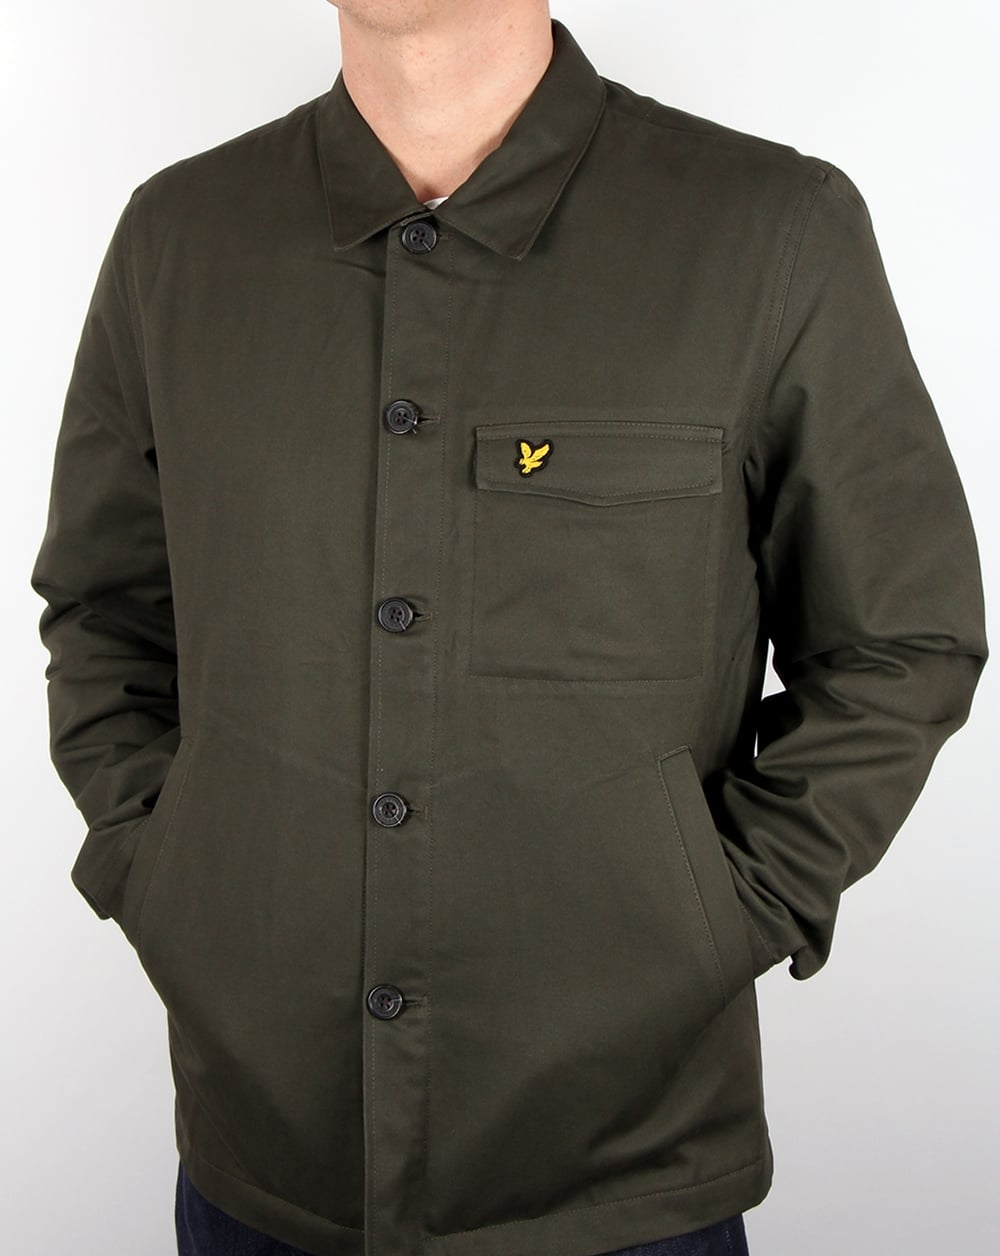 Lyle And Scott Shirt Jacket Dark Sage Men 39 S Top Coat